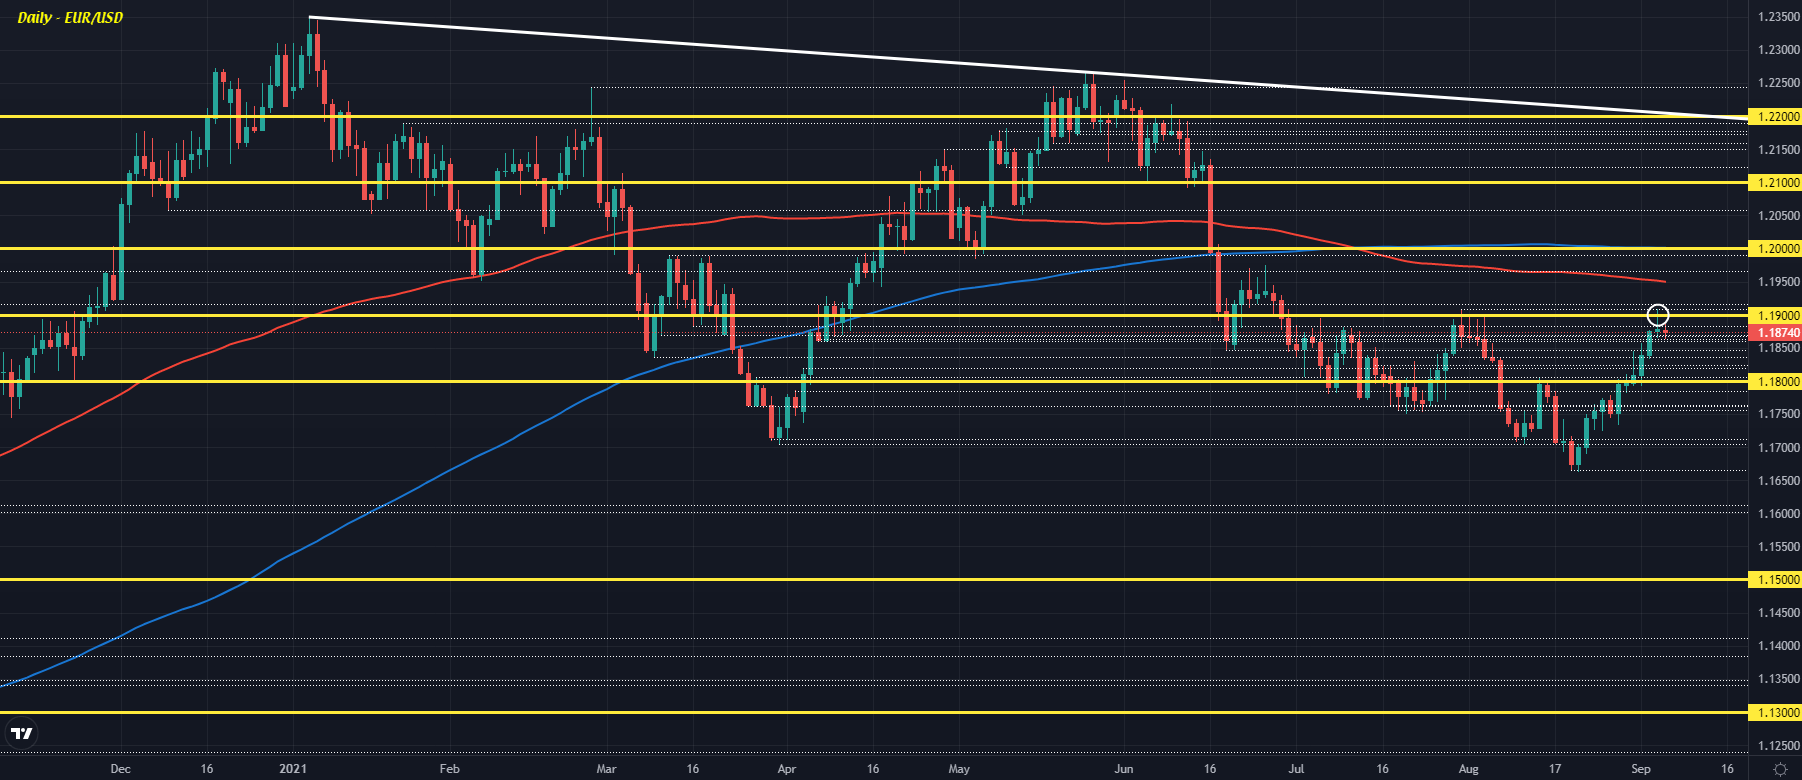 Dollar holds slight advance to start the session